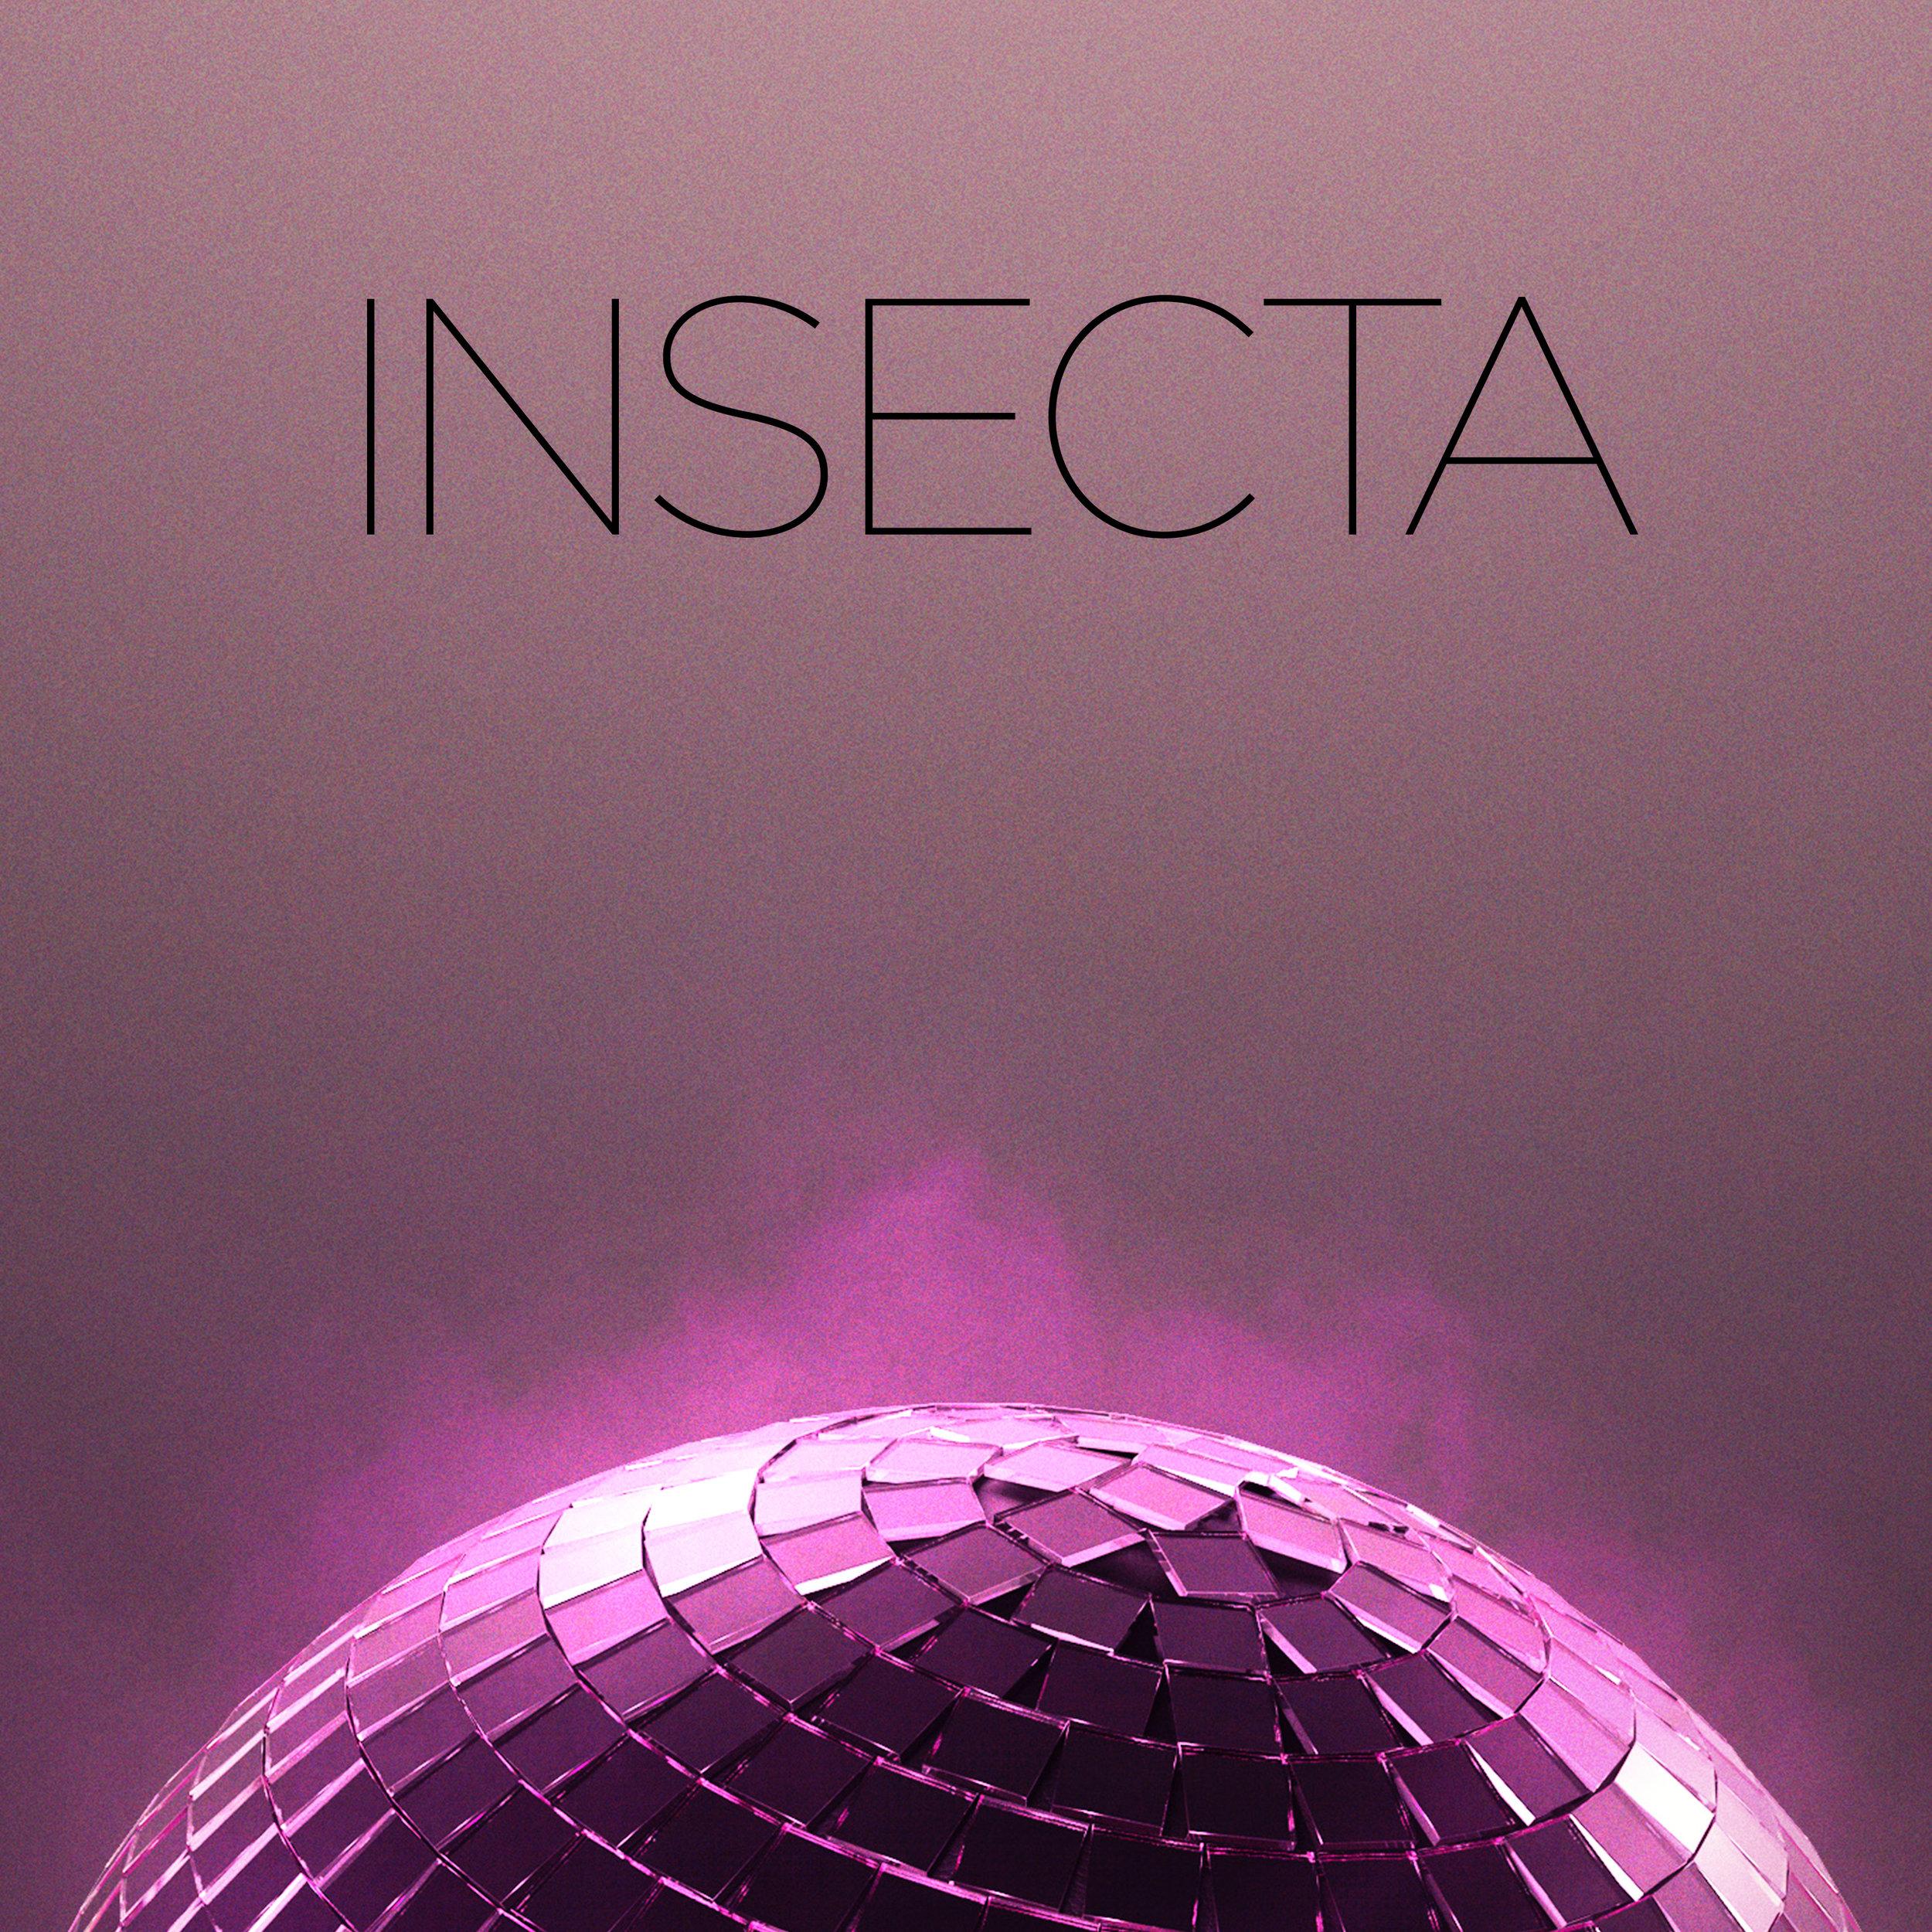 arte-insecta-3.jpg